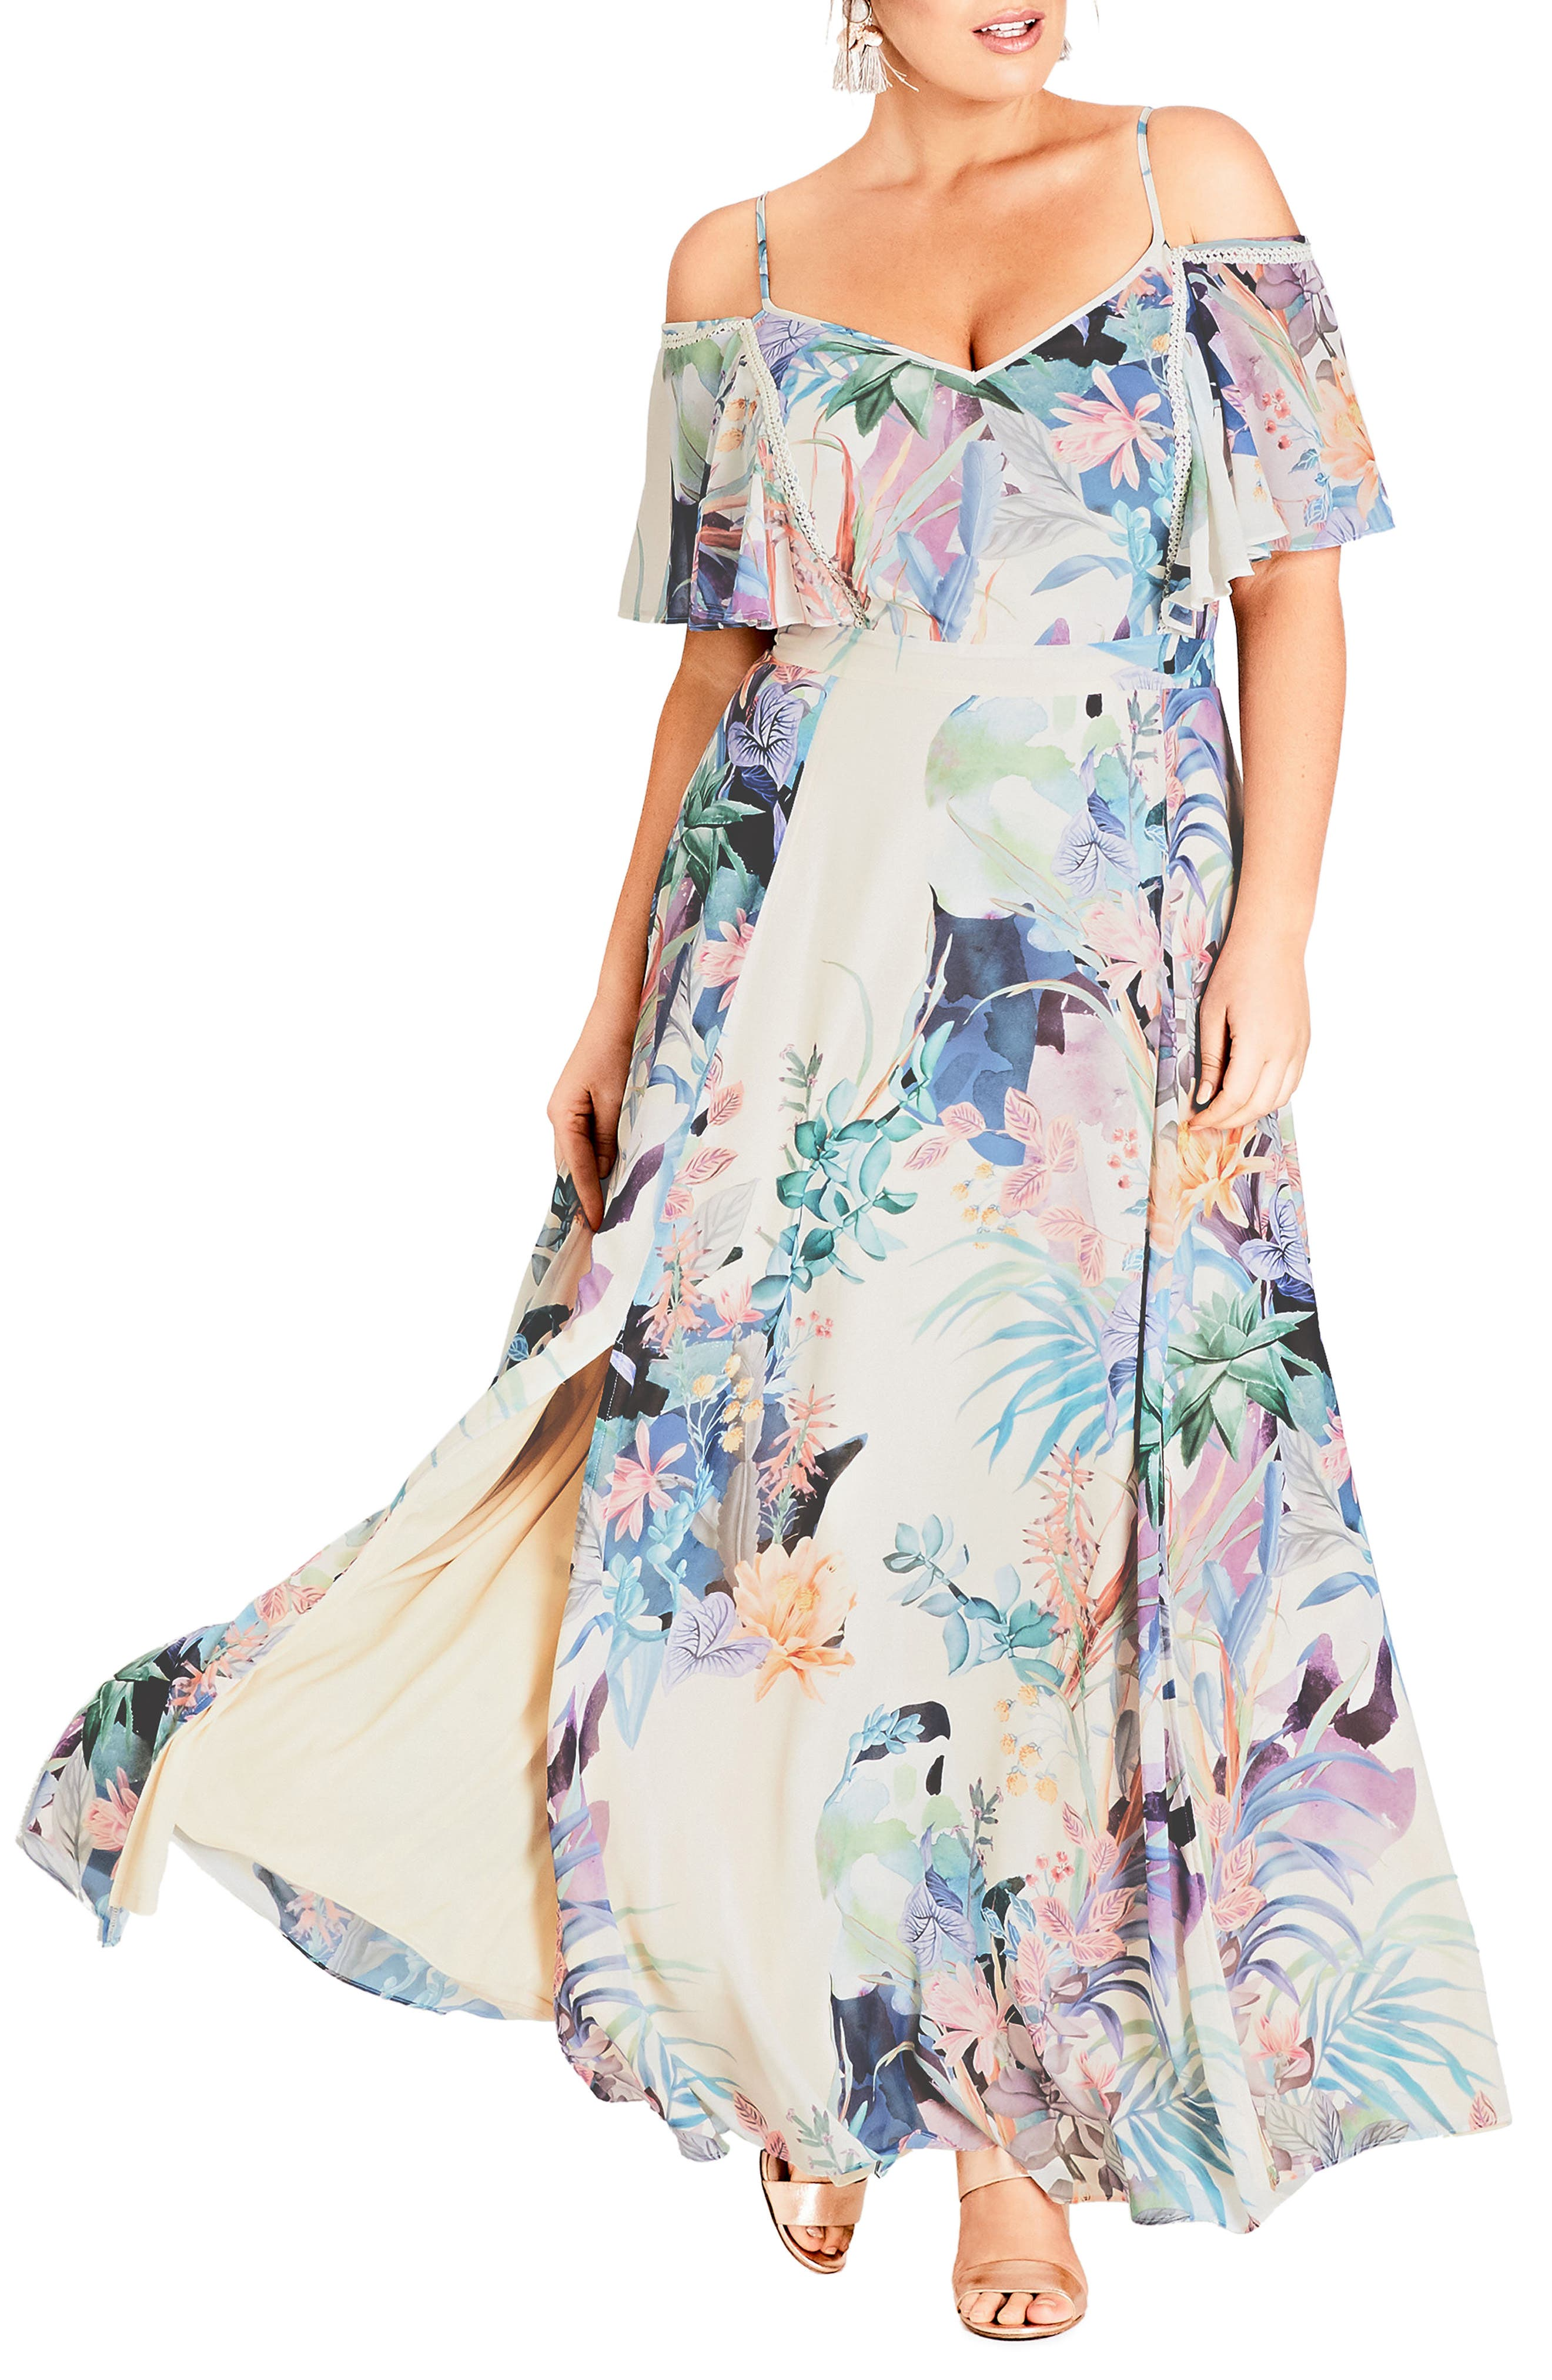 Plus Size City Chic Jungle Maxi Dress, Ivory